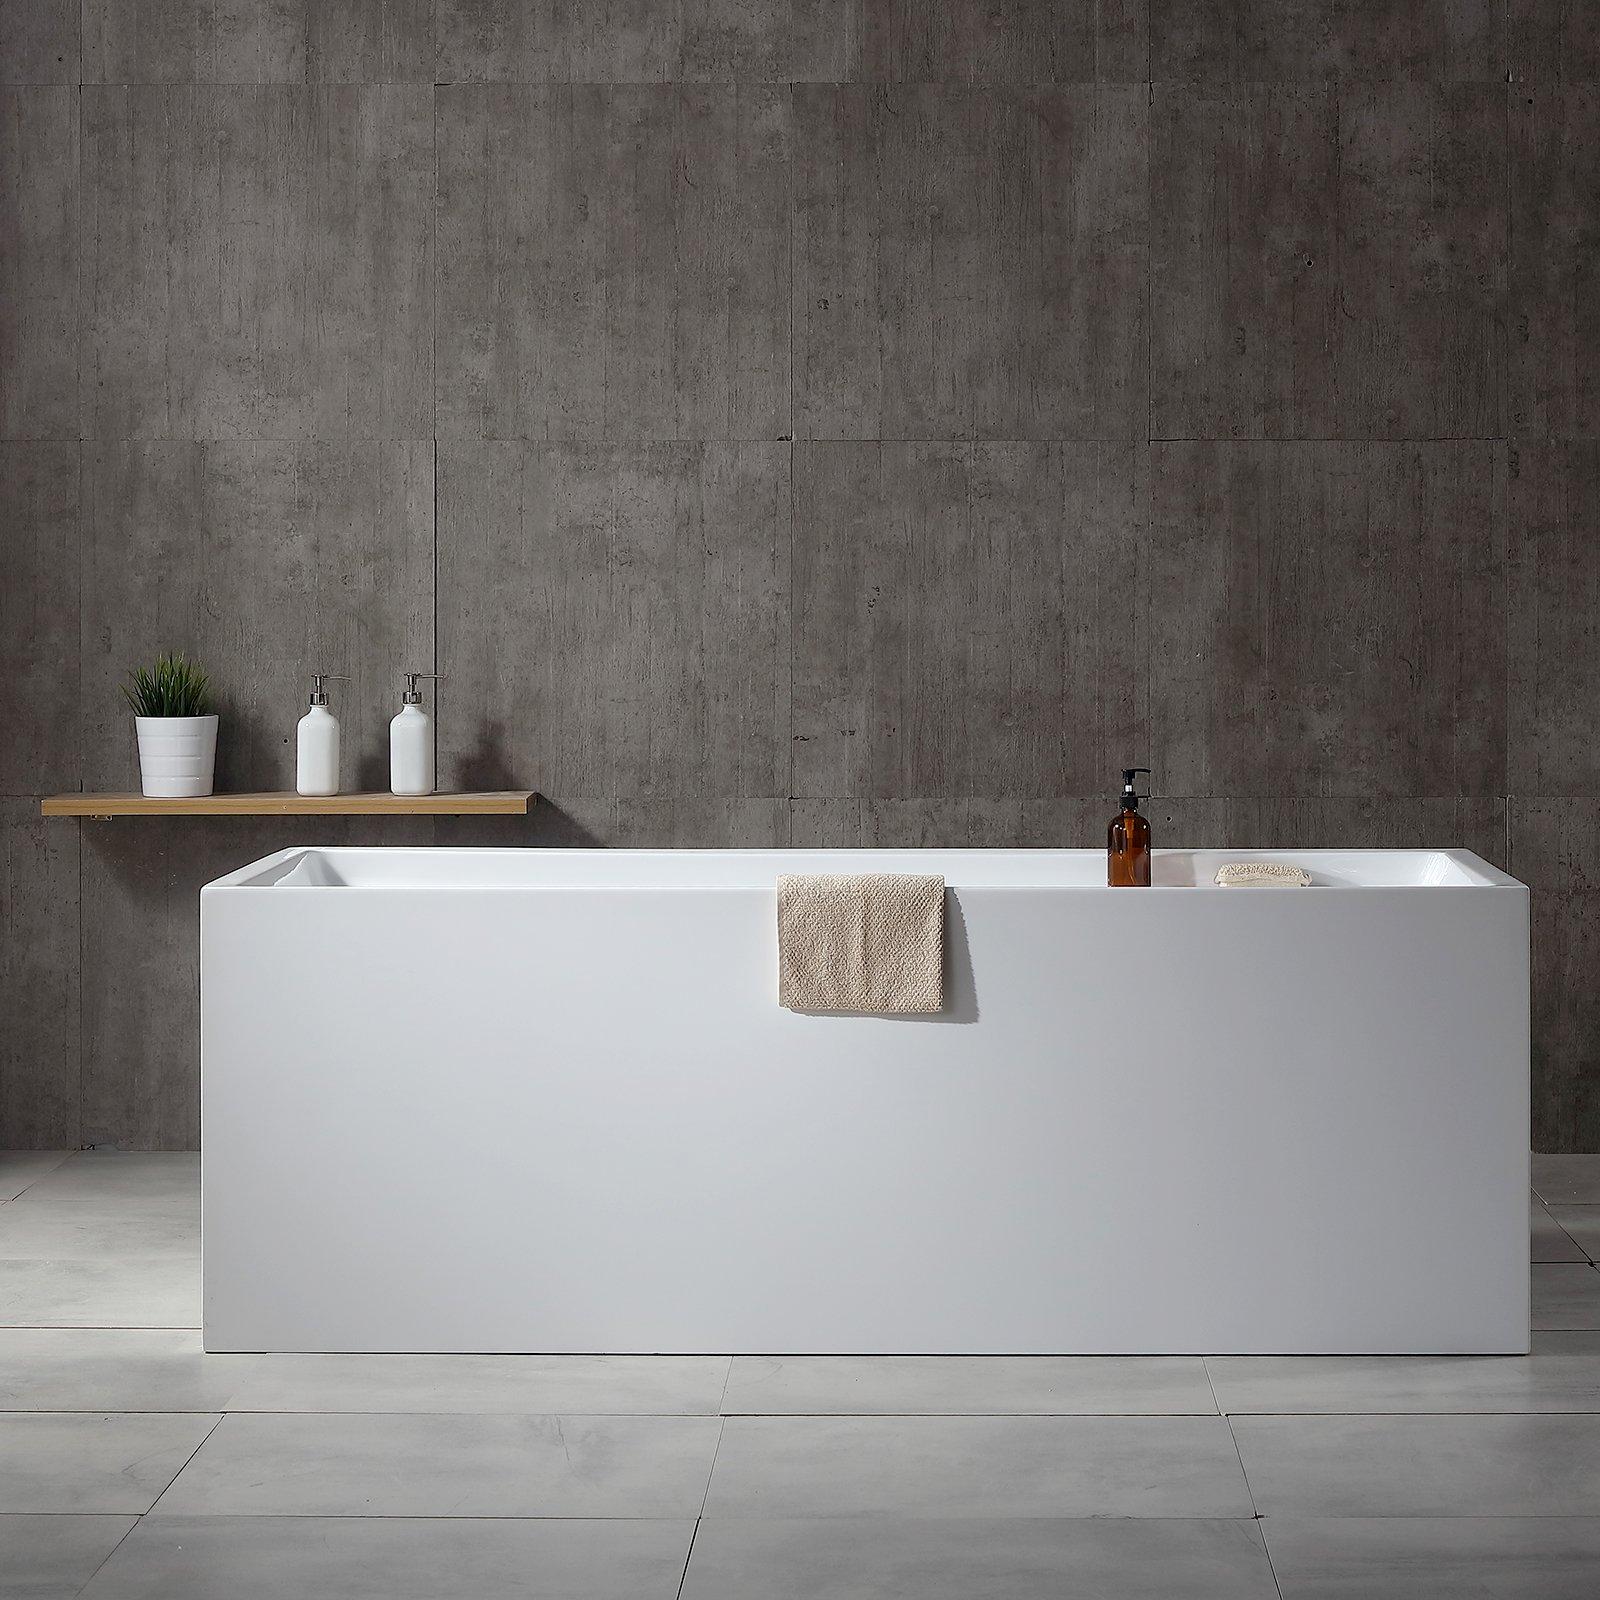 Freistehende Badewanne VERONA Acryl weiß - 170 x 80 x 60 cm - Standarmatur wählbar zoom thumbnail 3